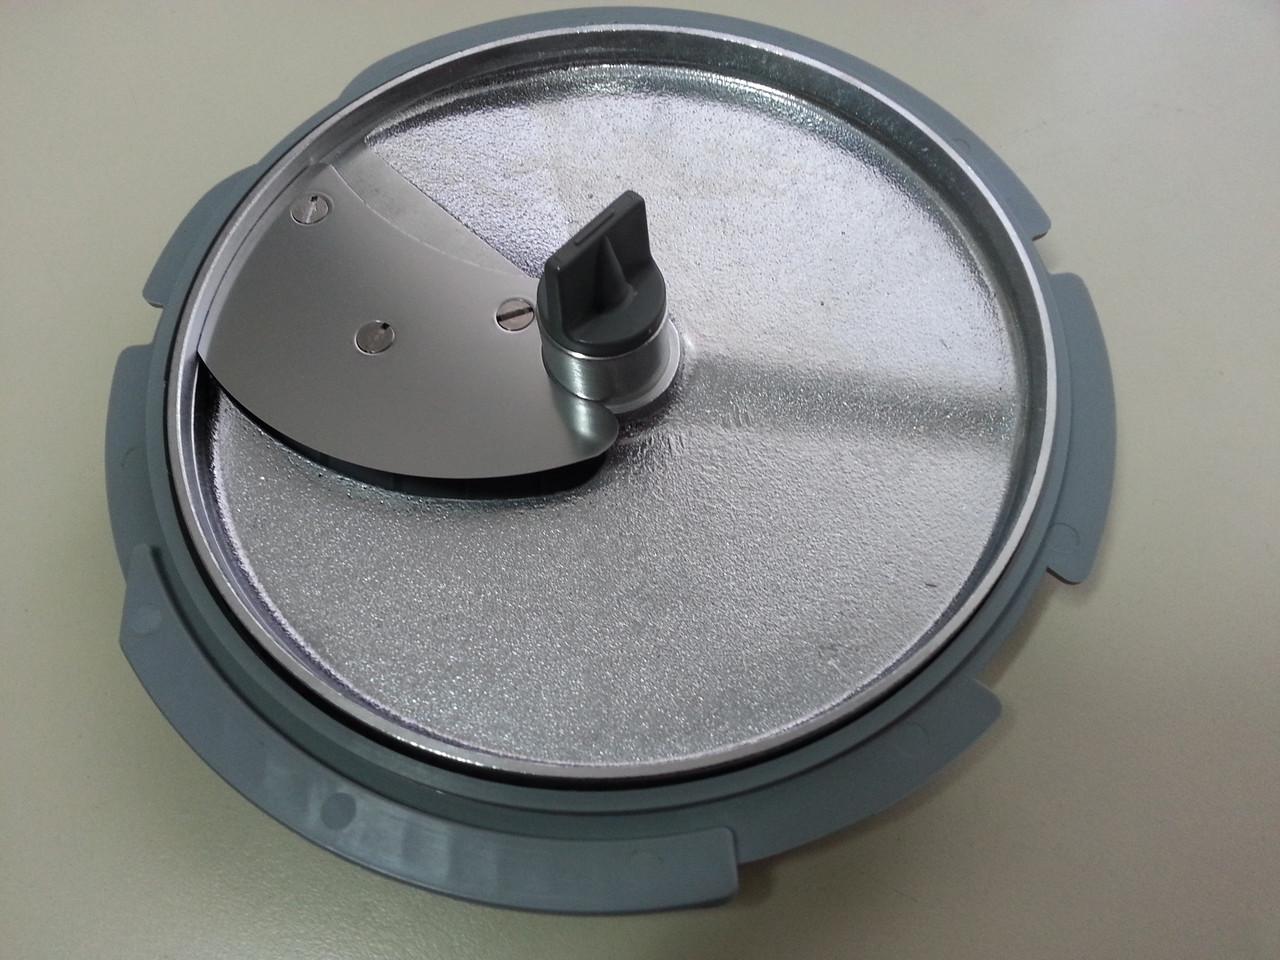 Диск F8 для овощерезки Robot Coupe CL30 соломка-фри 8x8 мм